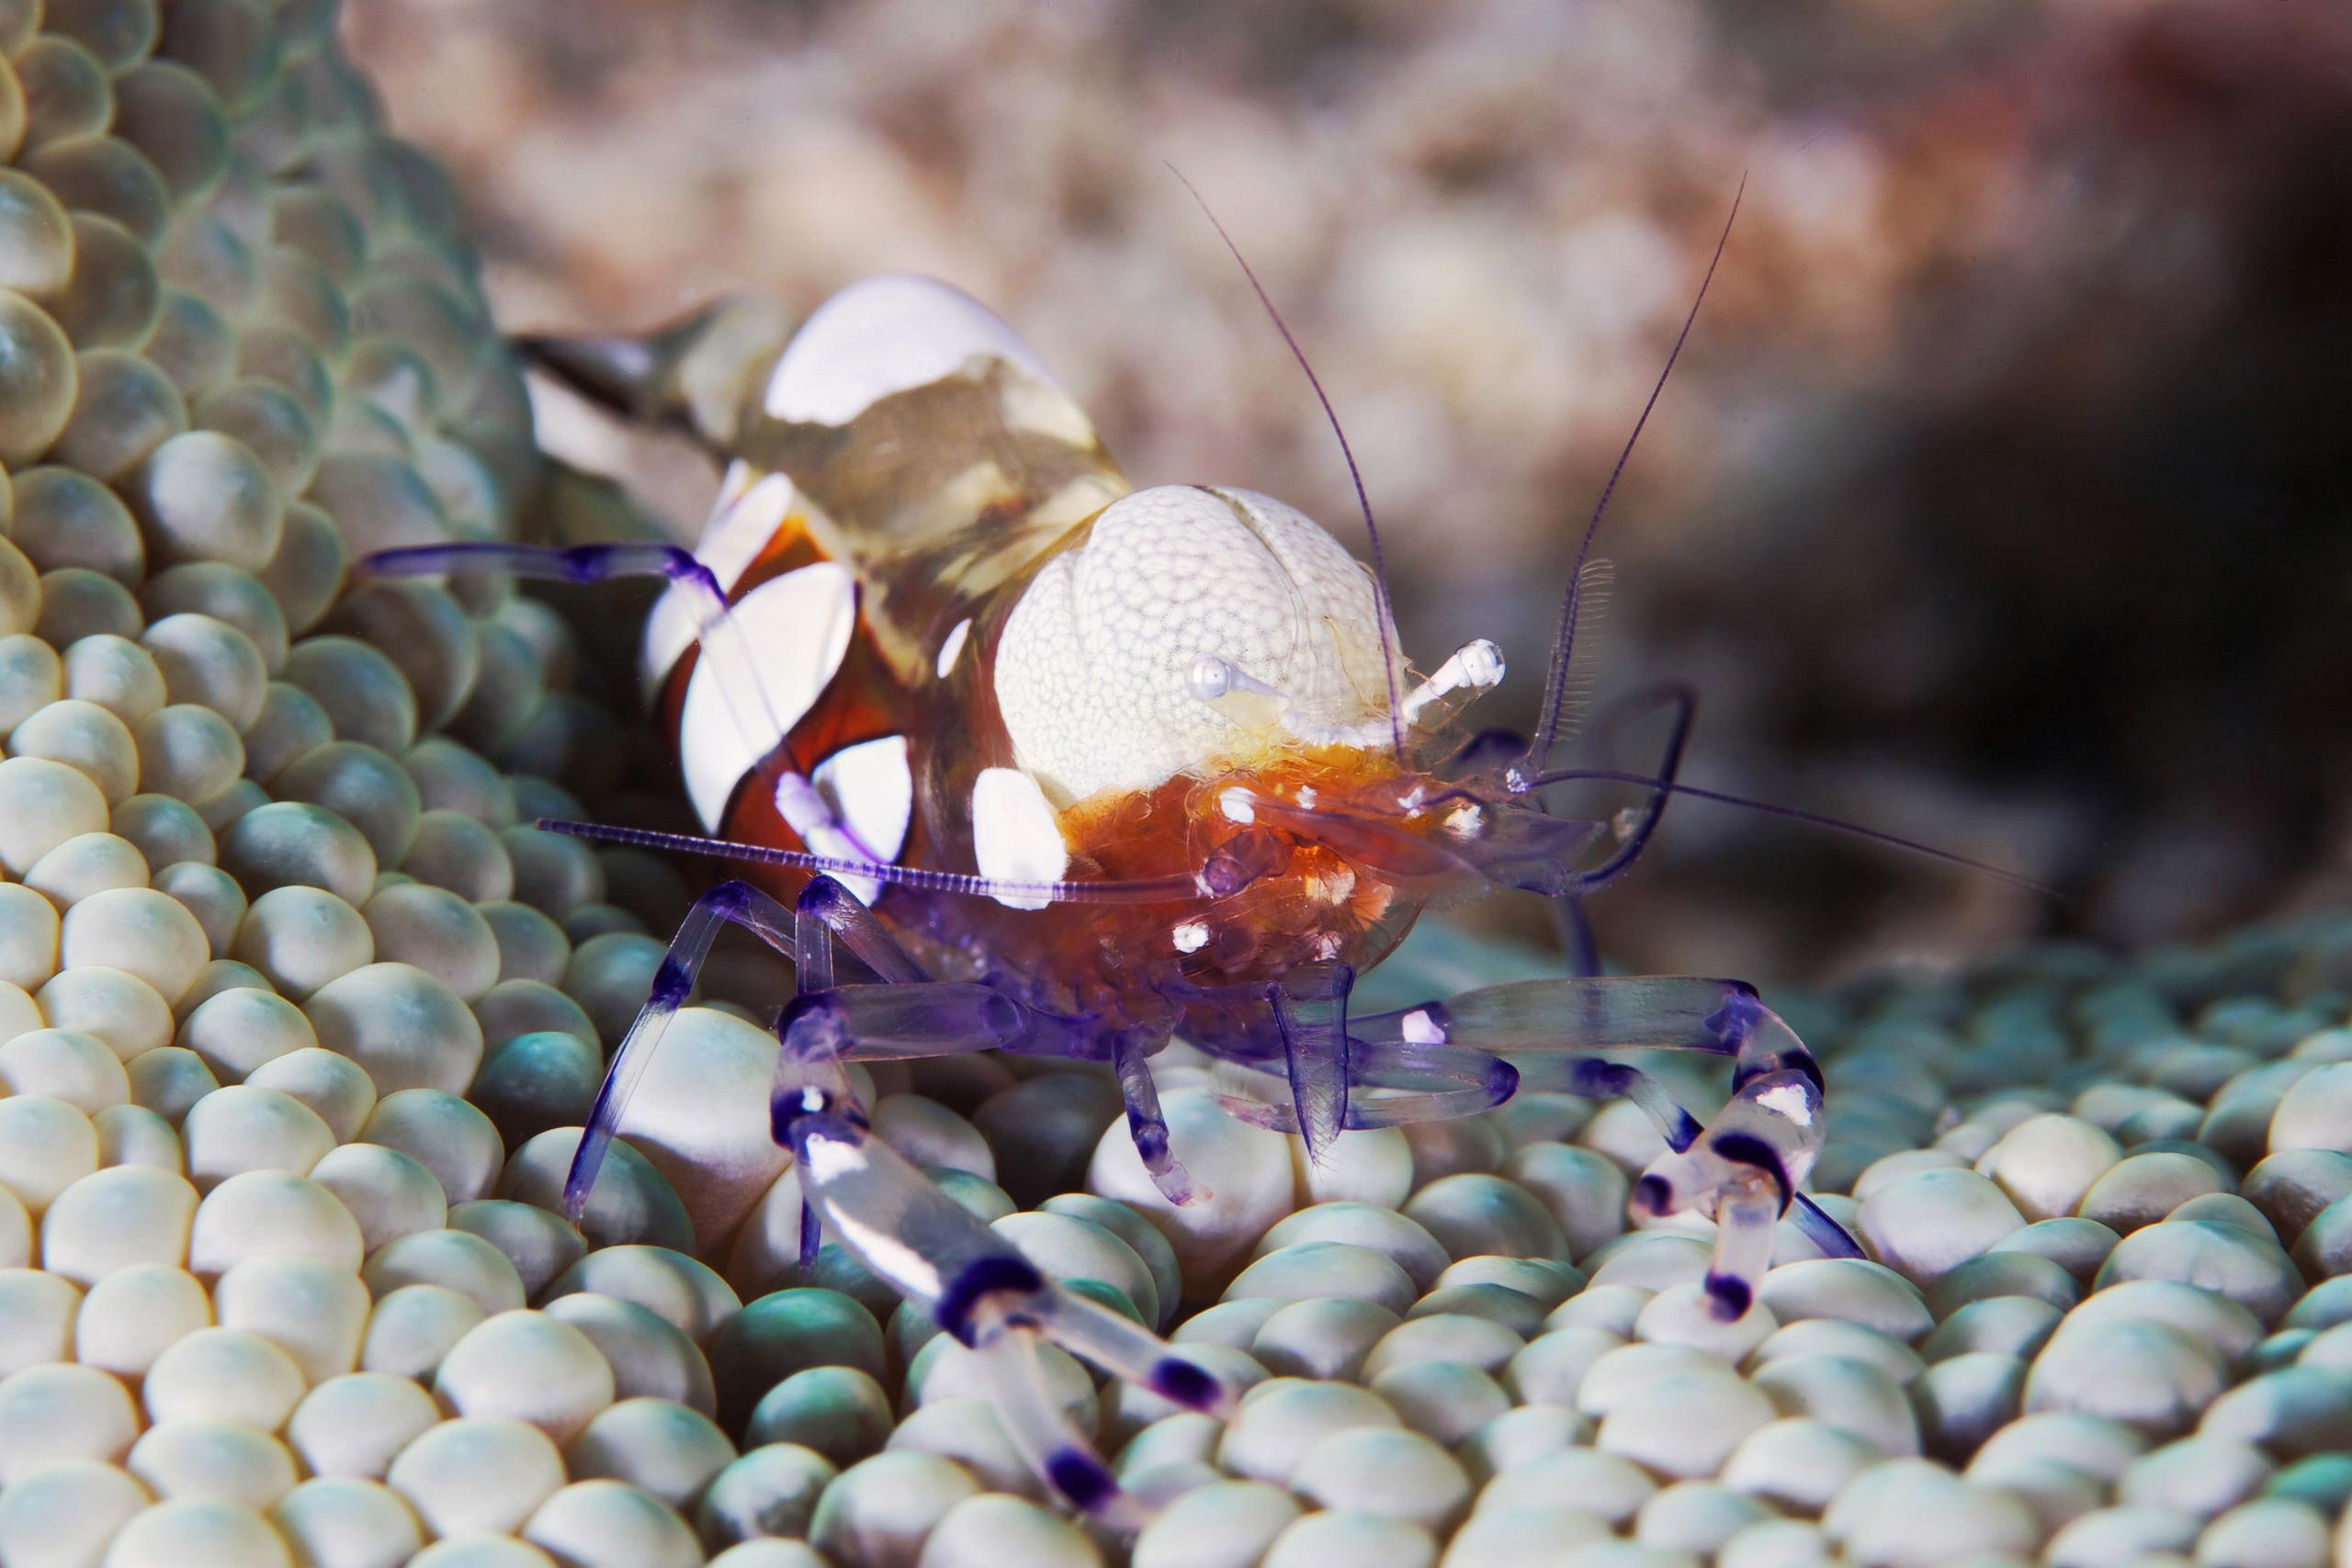 Crustacea – Periclimenes brevicarpalis